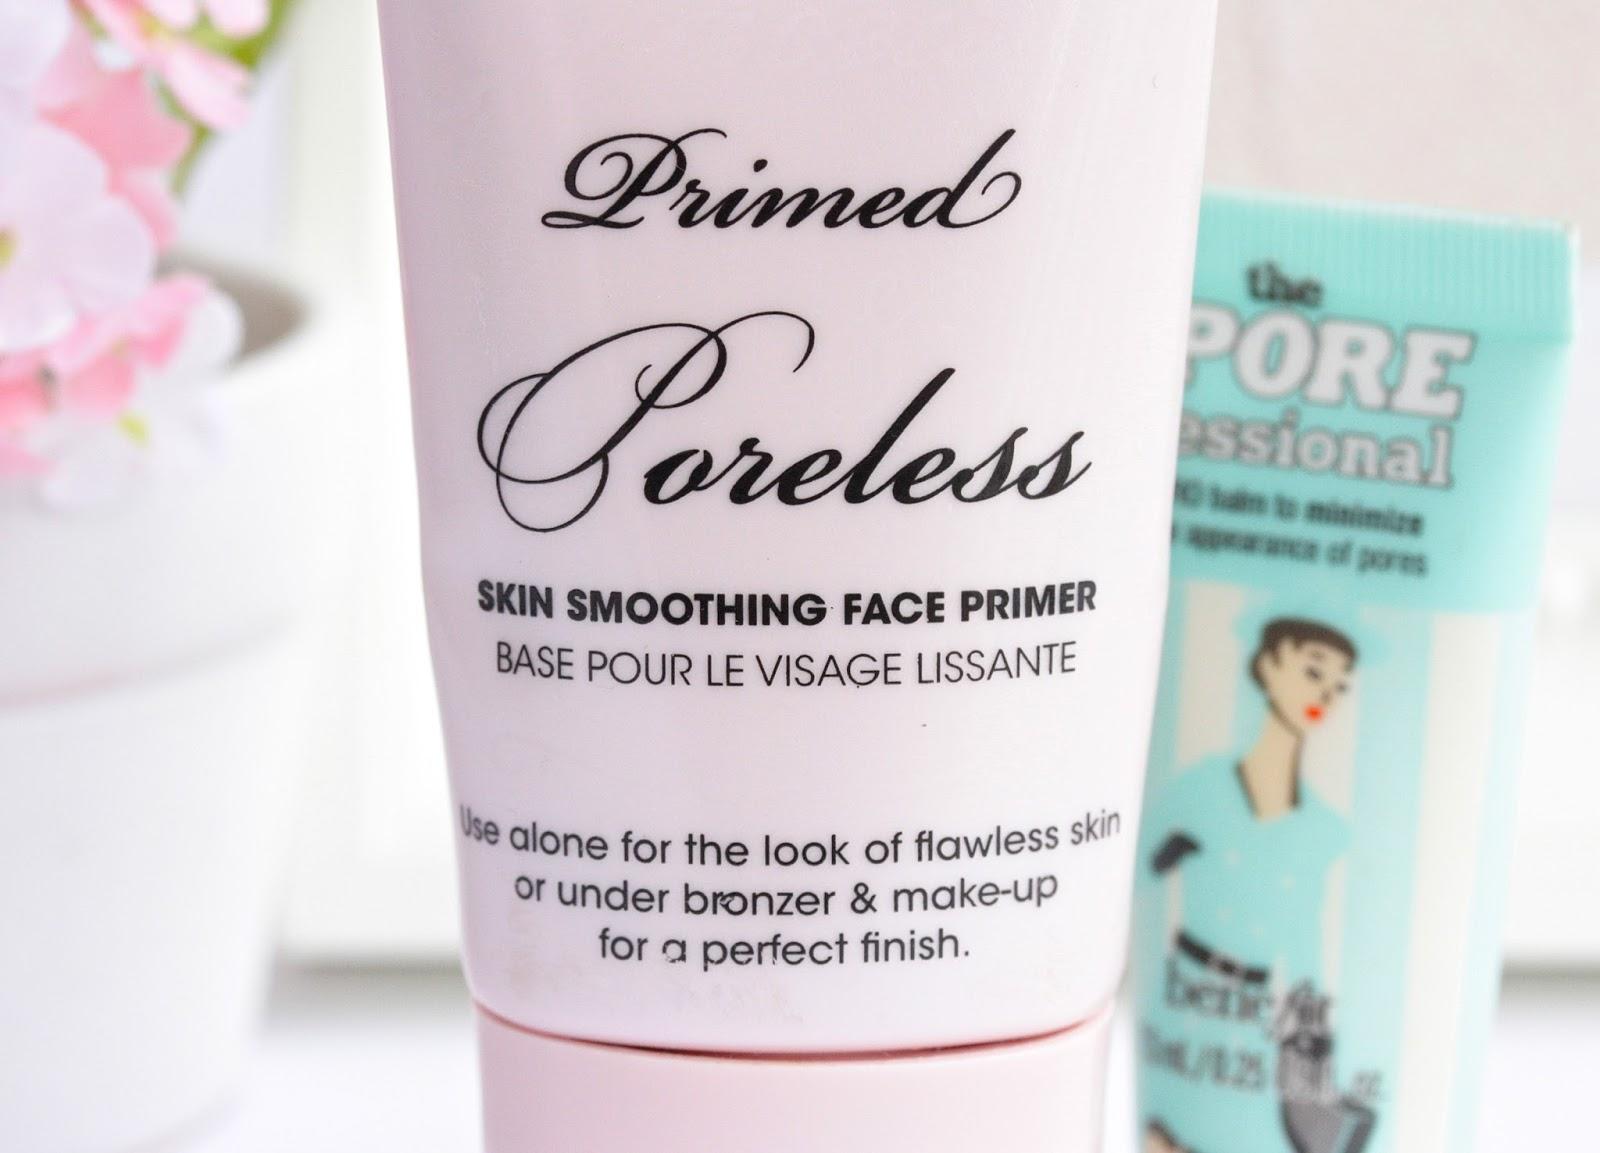 Primed & Poreless Skin Smoothing Face Primer by Too Faced #20